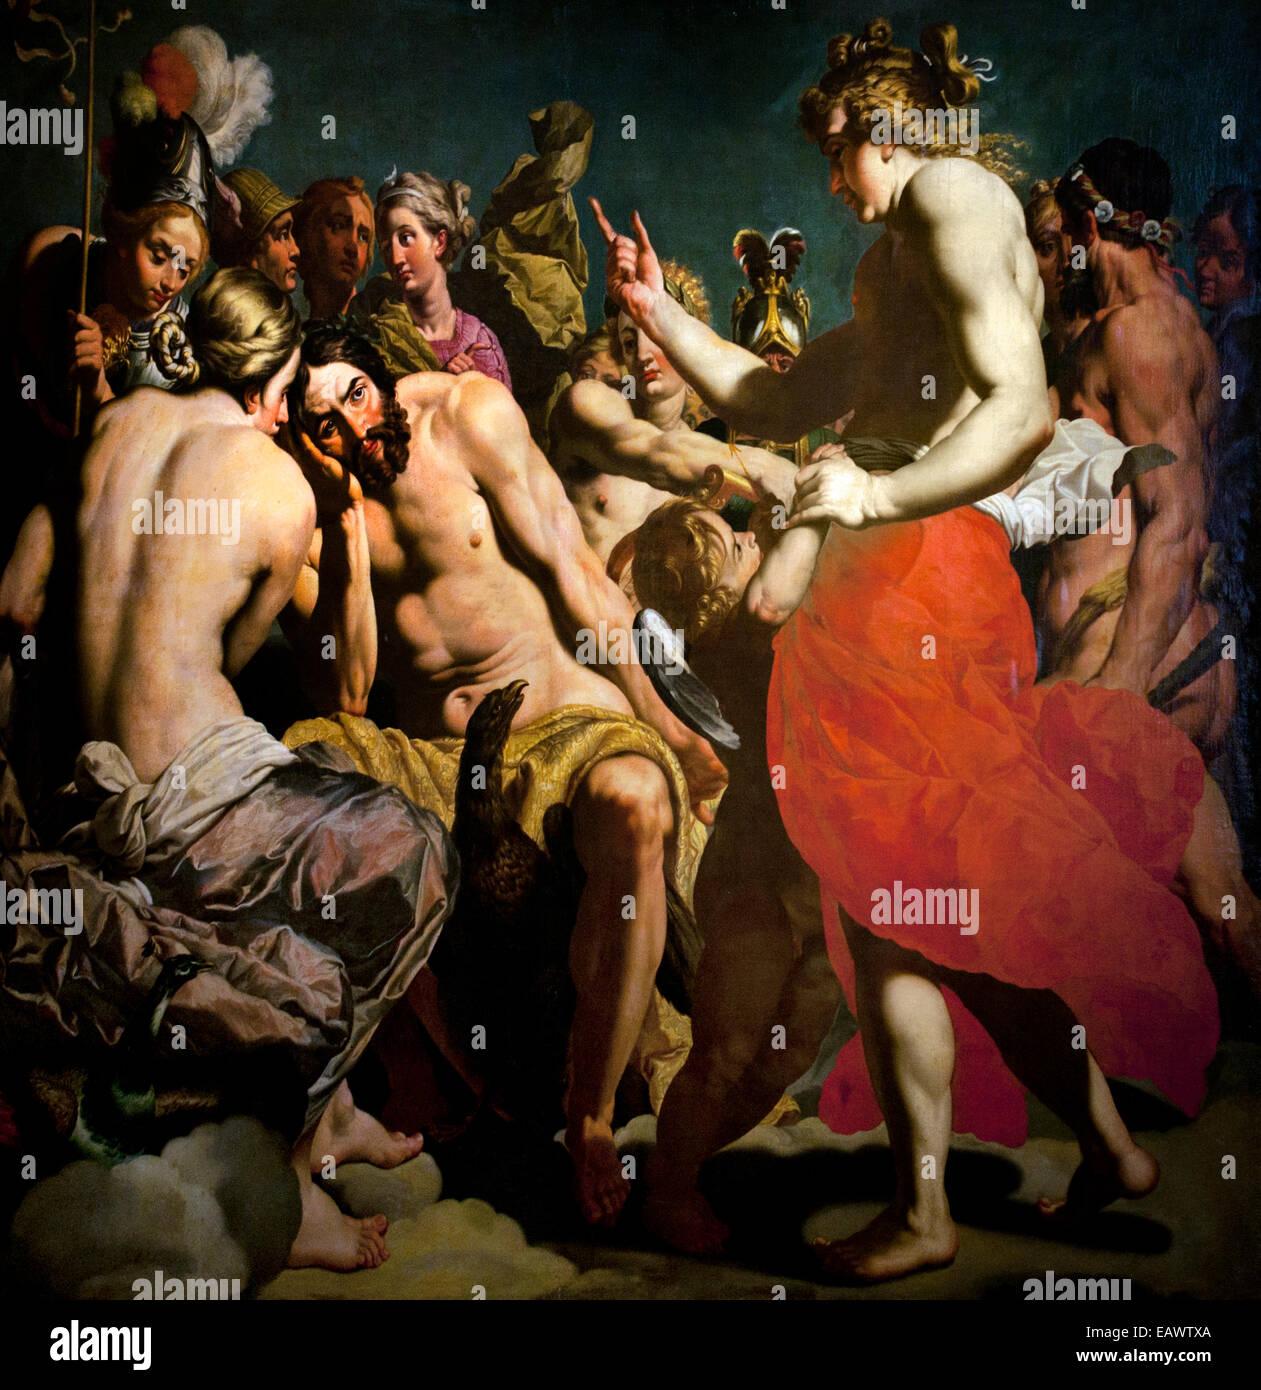 The gods of Olympe by Abraham Janssens 1575-1632 Flemish Baroque  Belgian Belgium - Stock Image